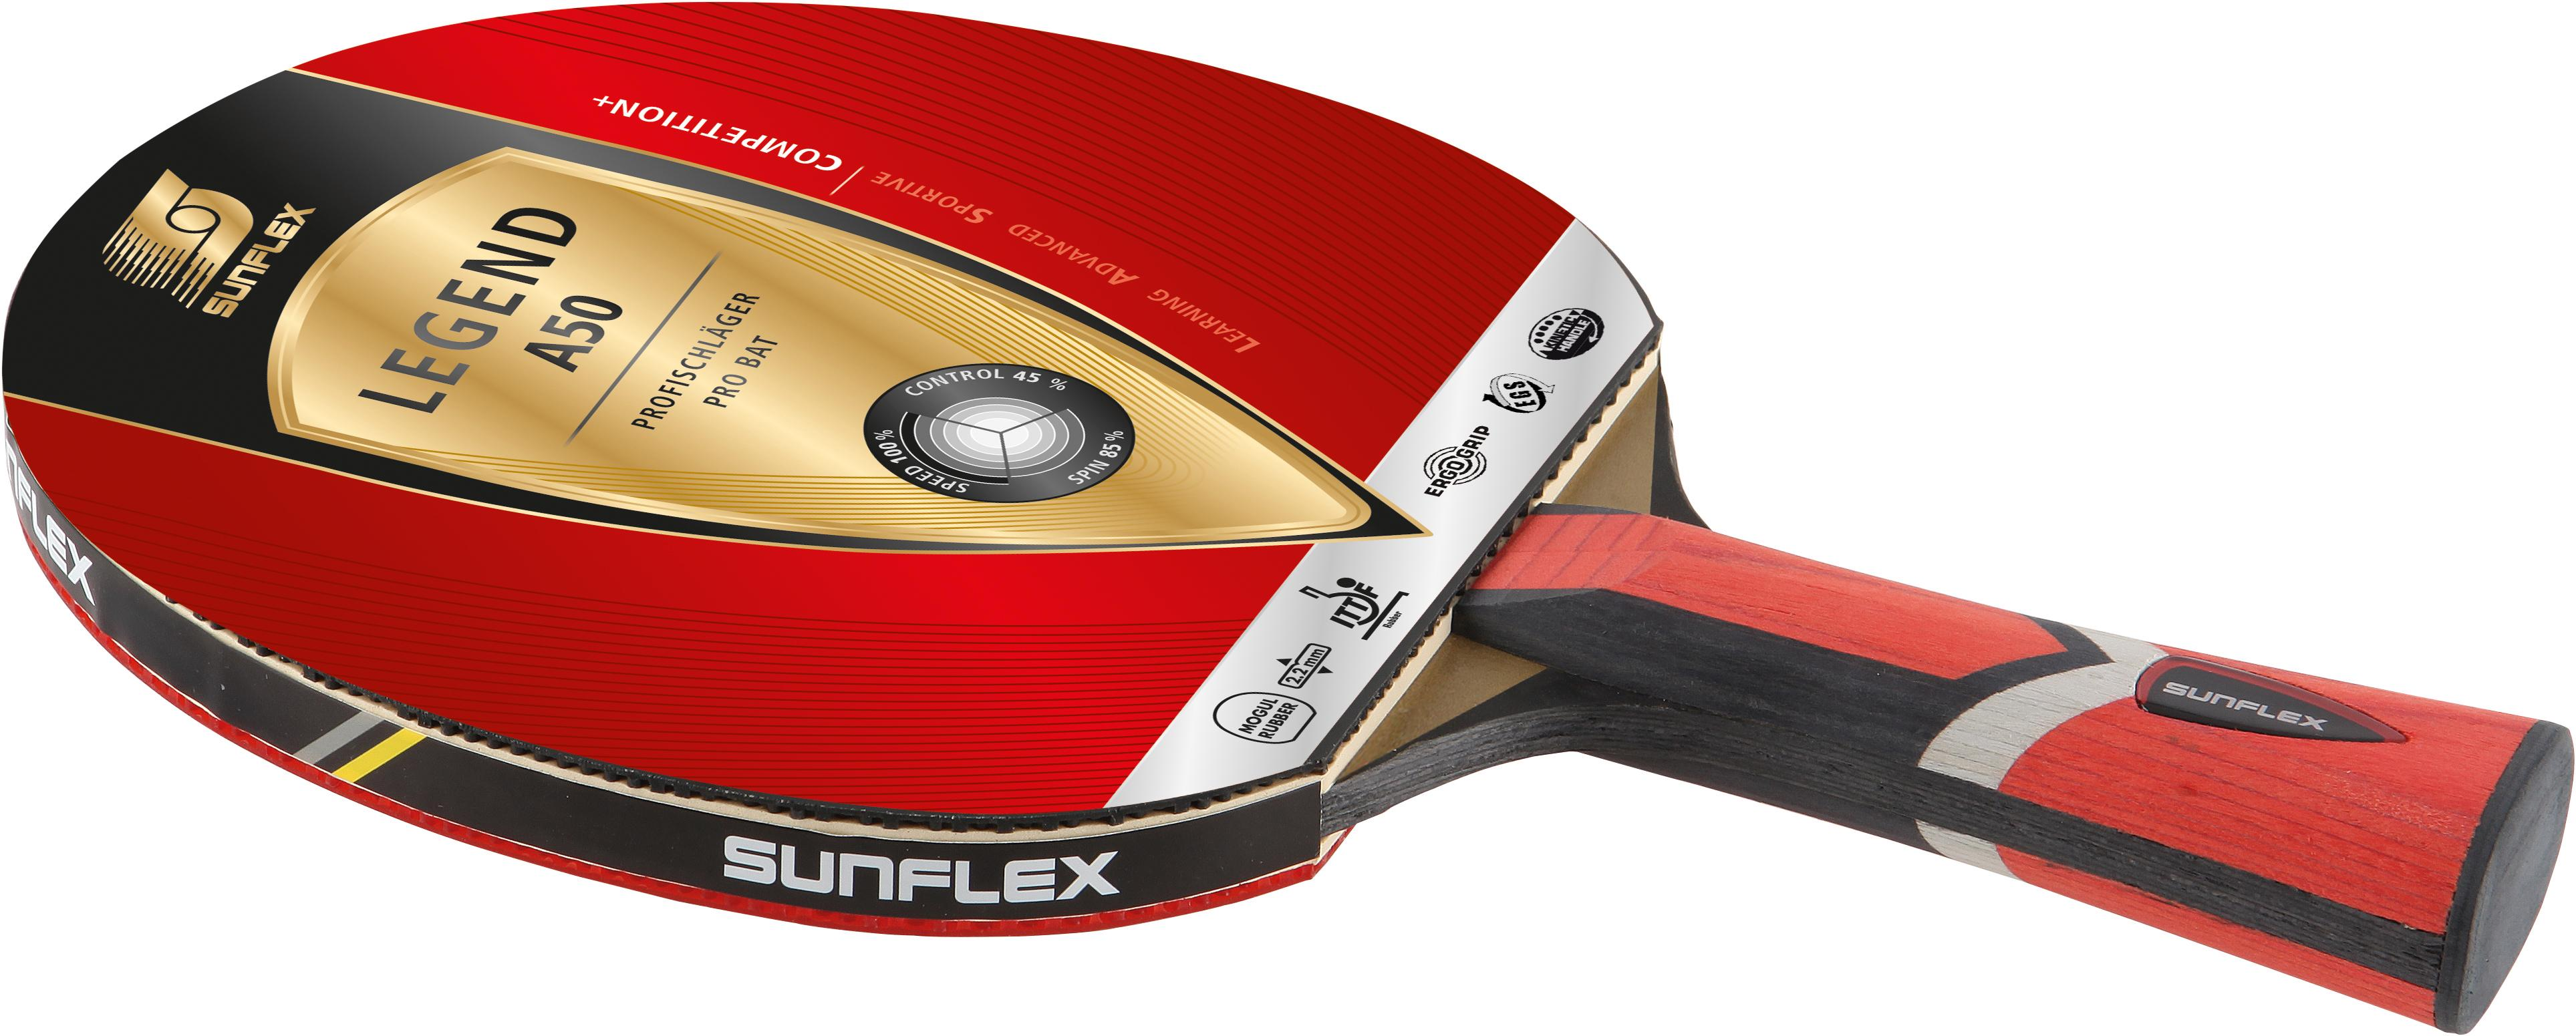 Sunflex Tischtennisschläger LEGEND A50 rot Tischtennis-Ausrüstung Tischtennis Sportarten